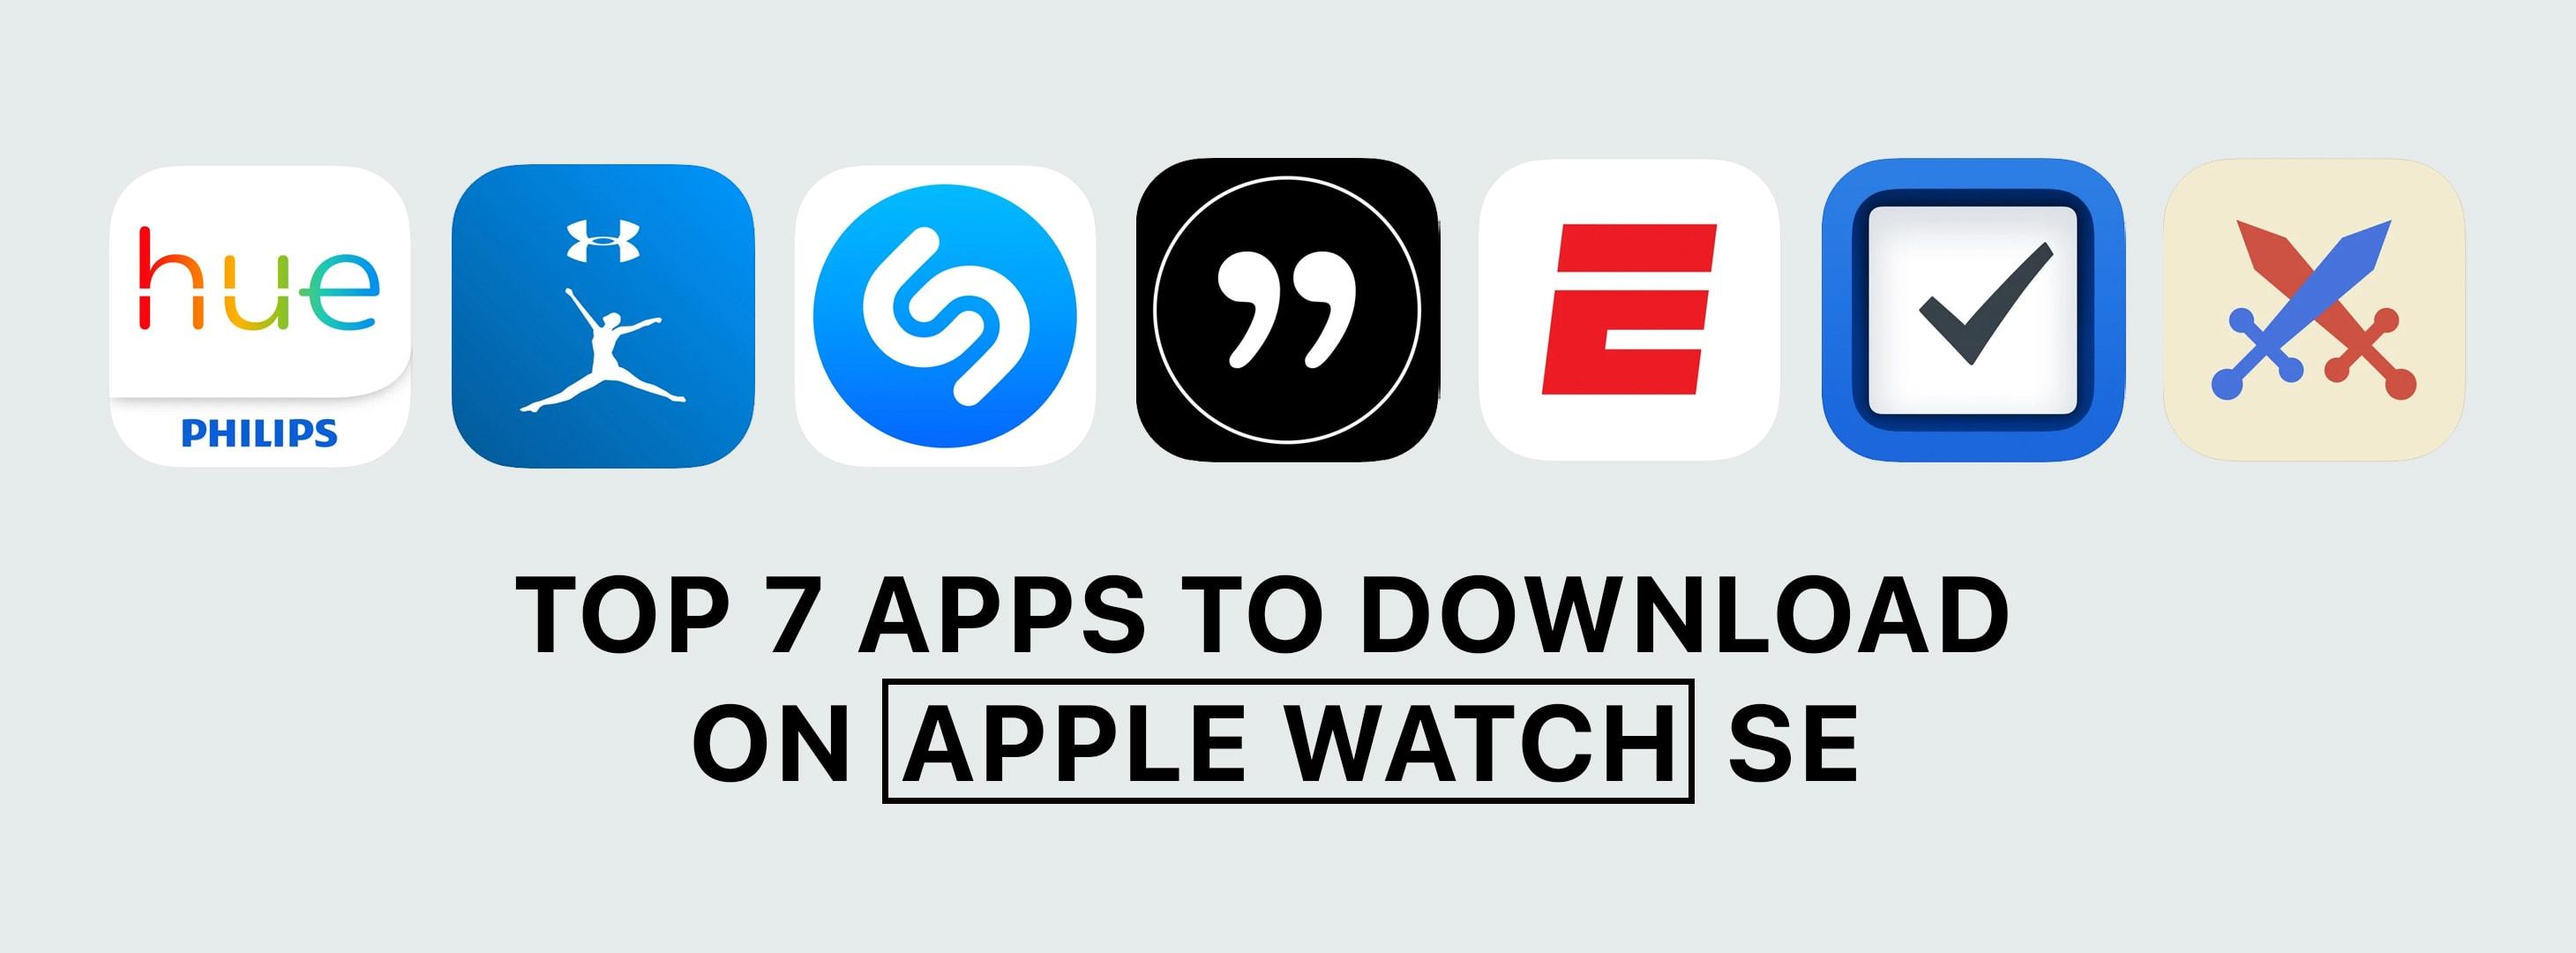 allapplenews-top-apps-apple-watch-se